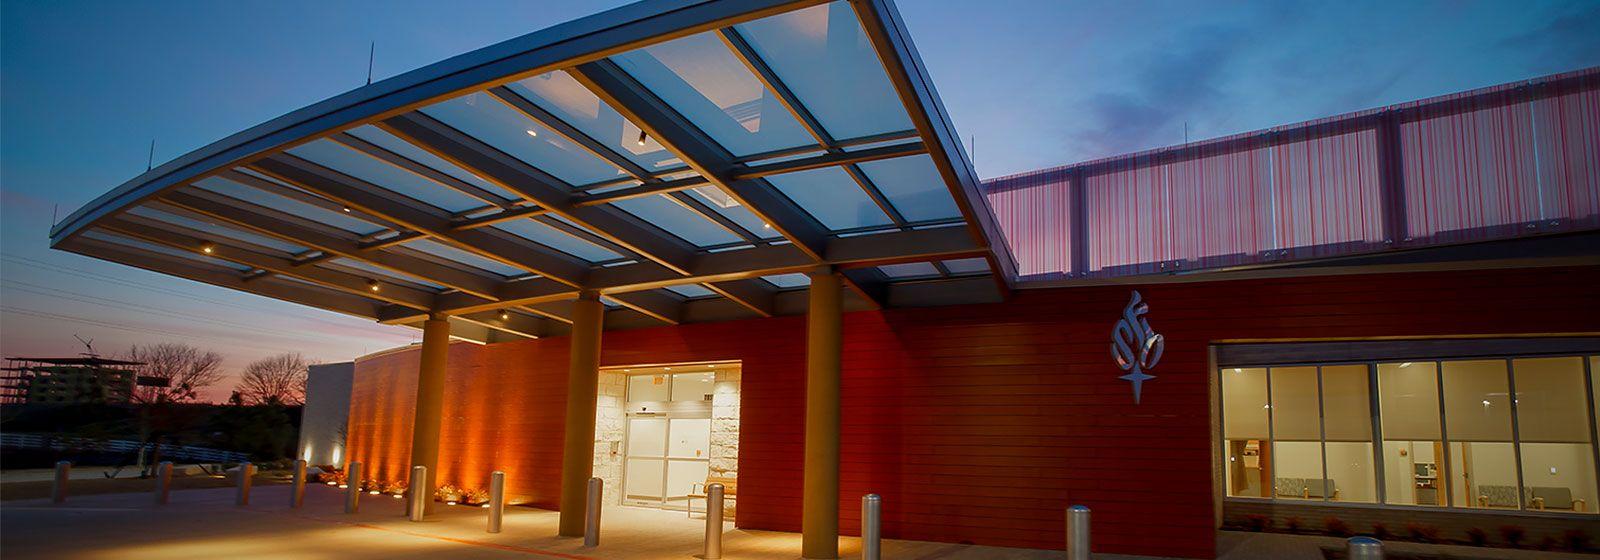 Urgent Care & WalkIn Clinics, Tulsa & Muskogee, Oklahoma